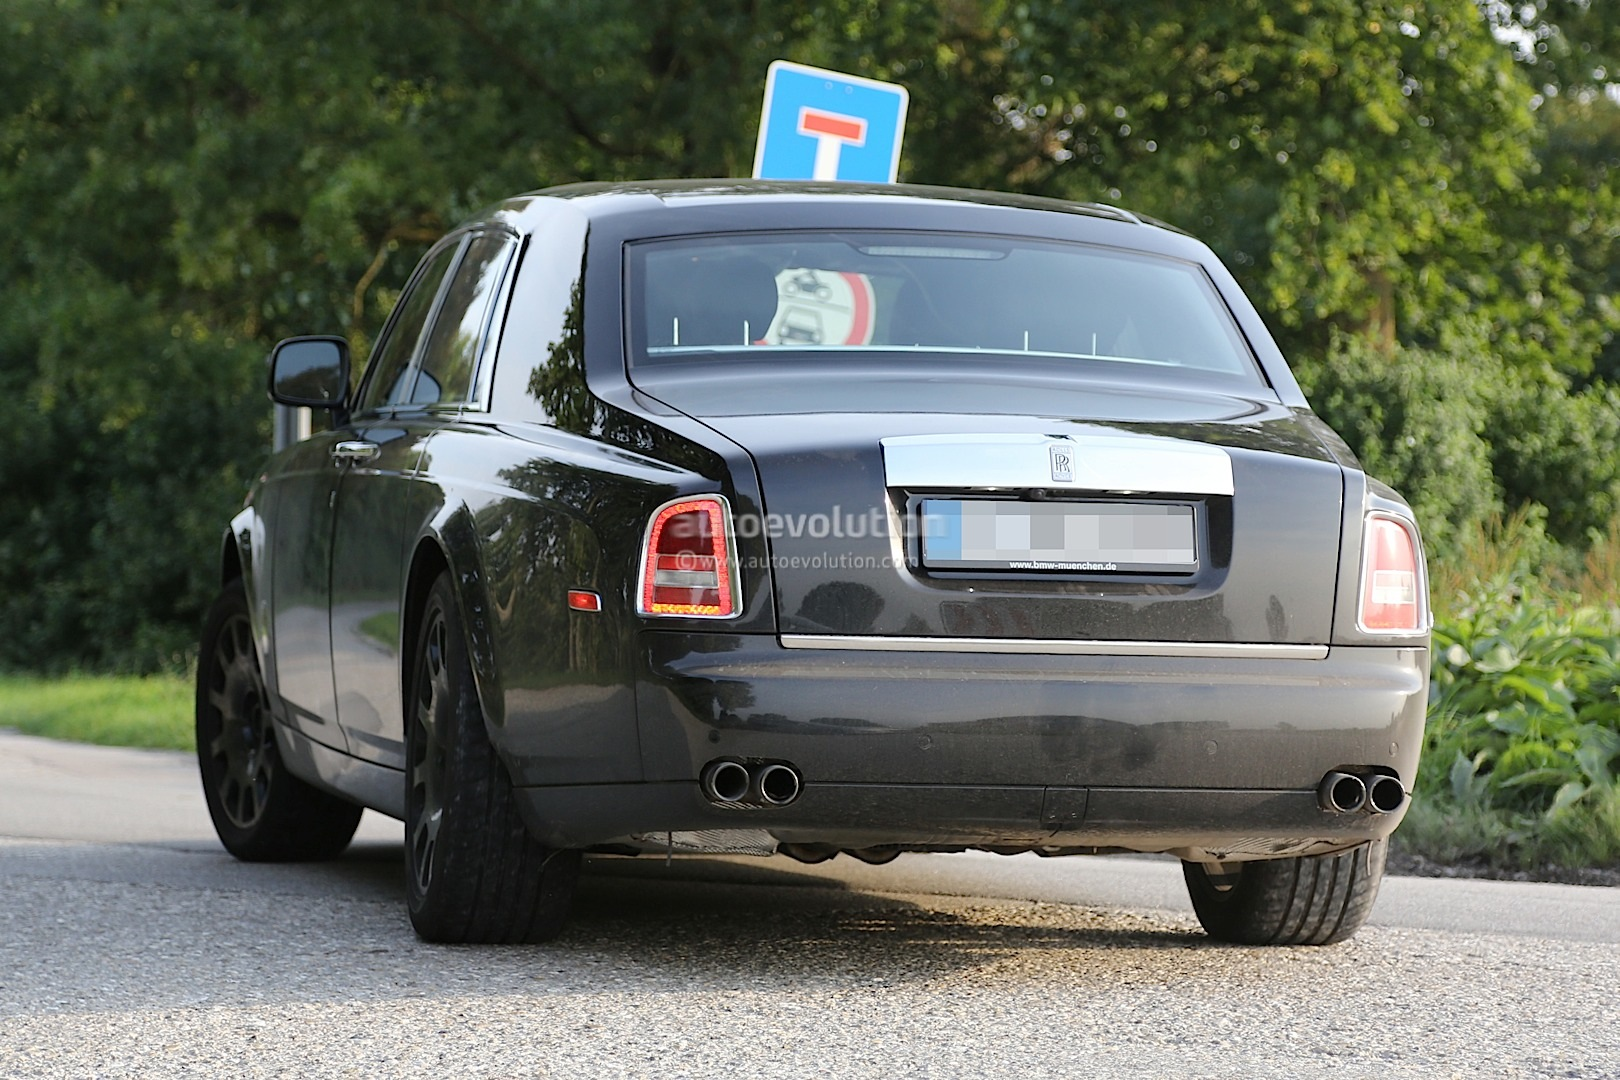 rolls royce phantom interior. Interior Spyshots Next Generation Rolls-Royce Phantom Rear Rolls Royce N